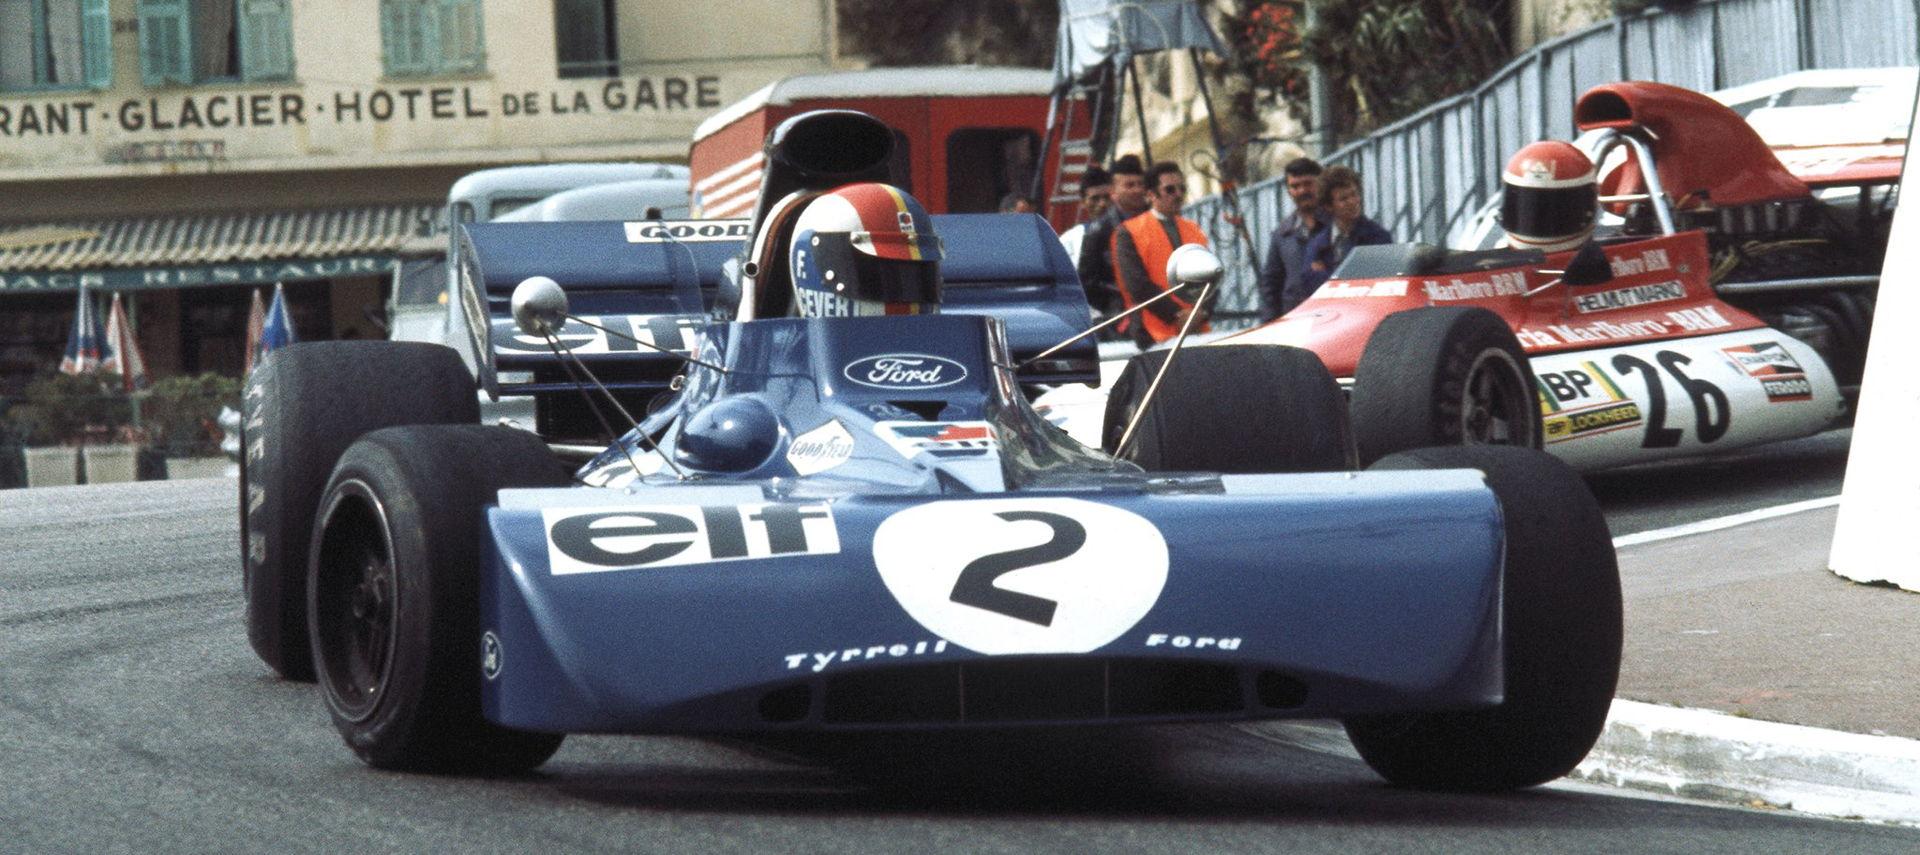 Francois Cevert, Helmut Marko, Monaco, 1972